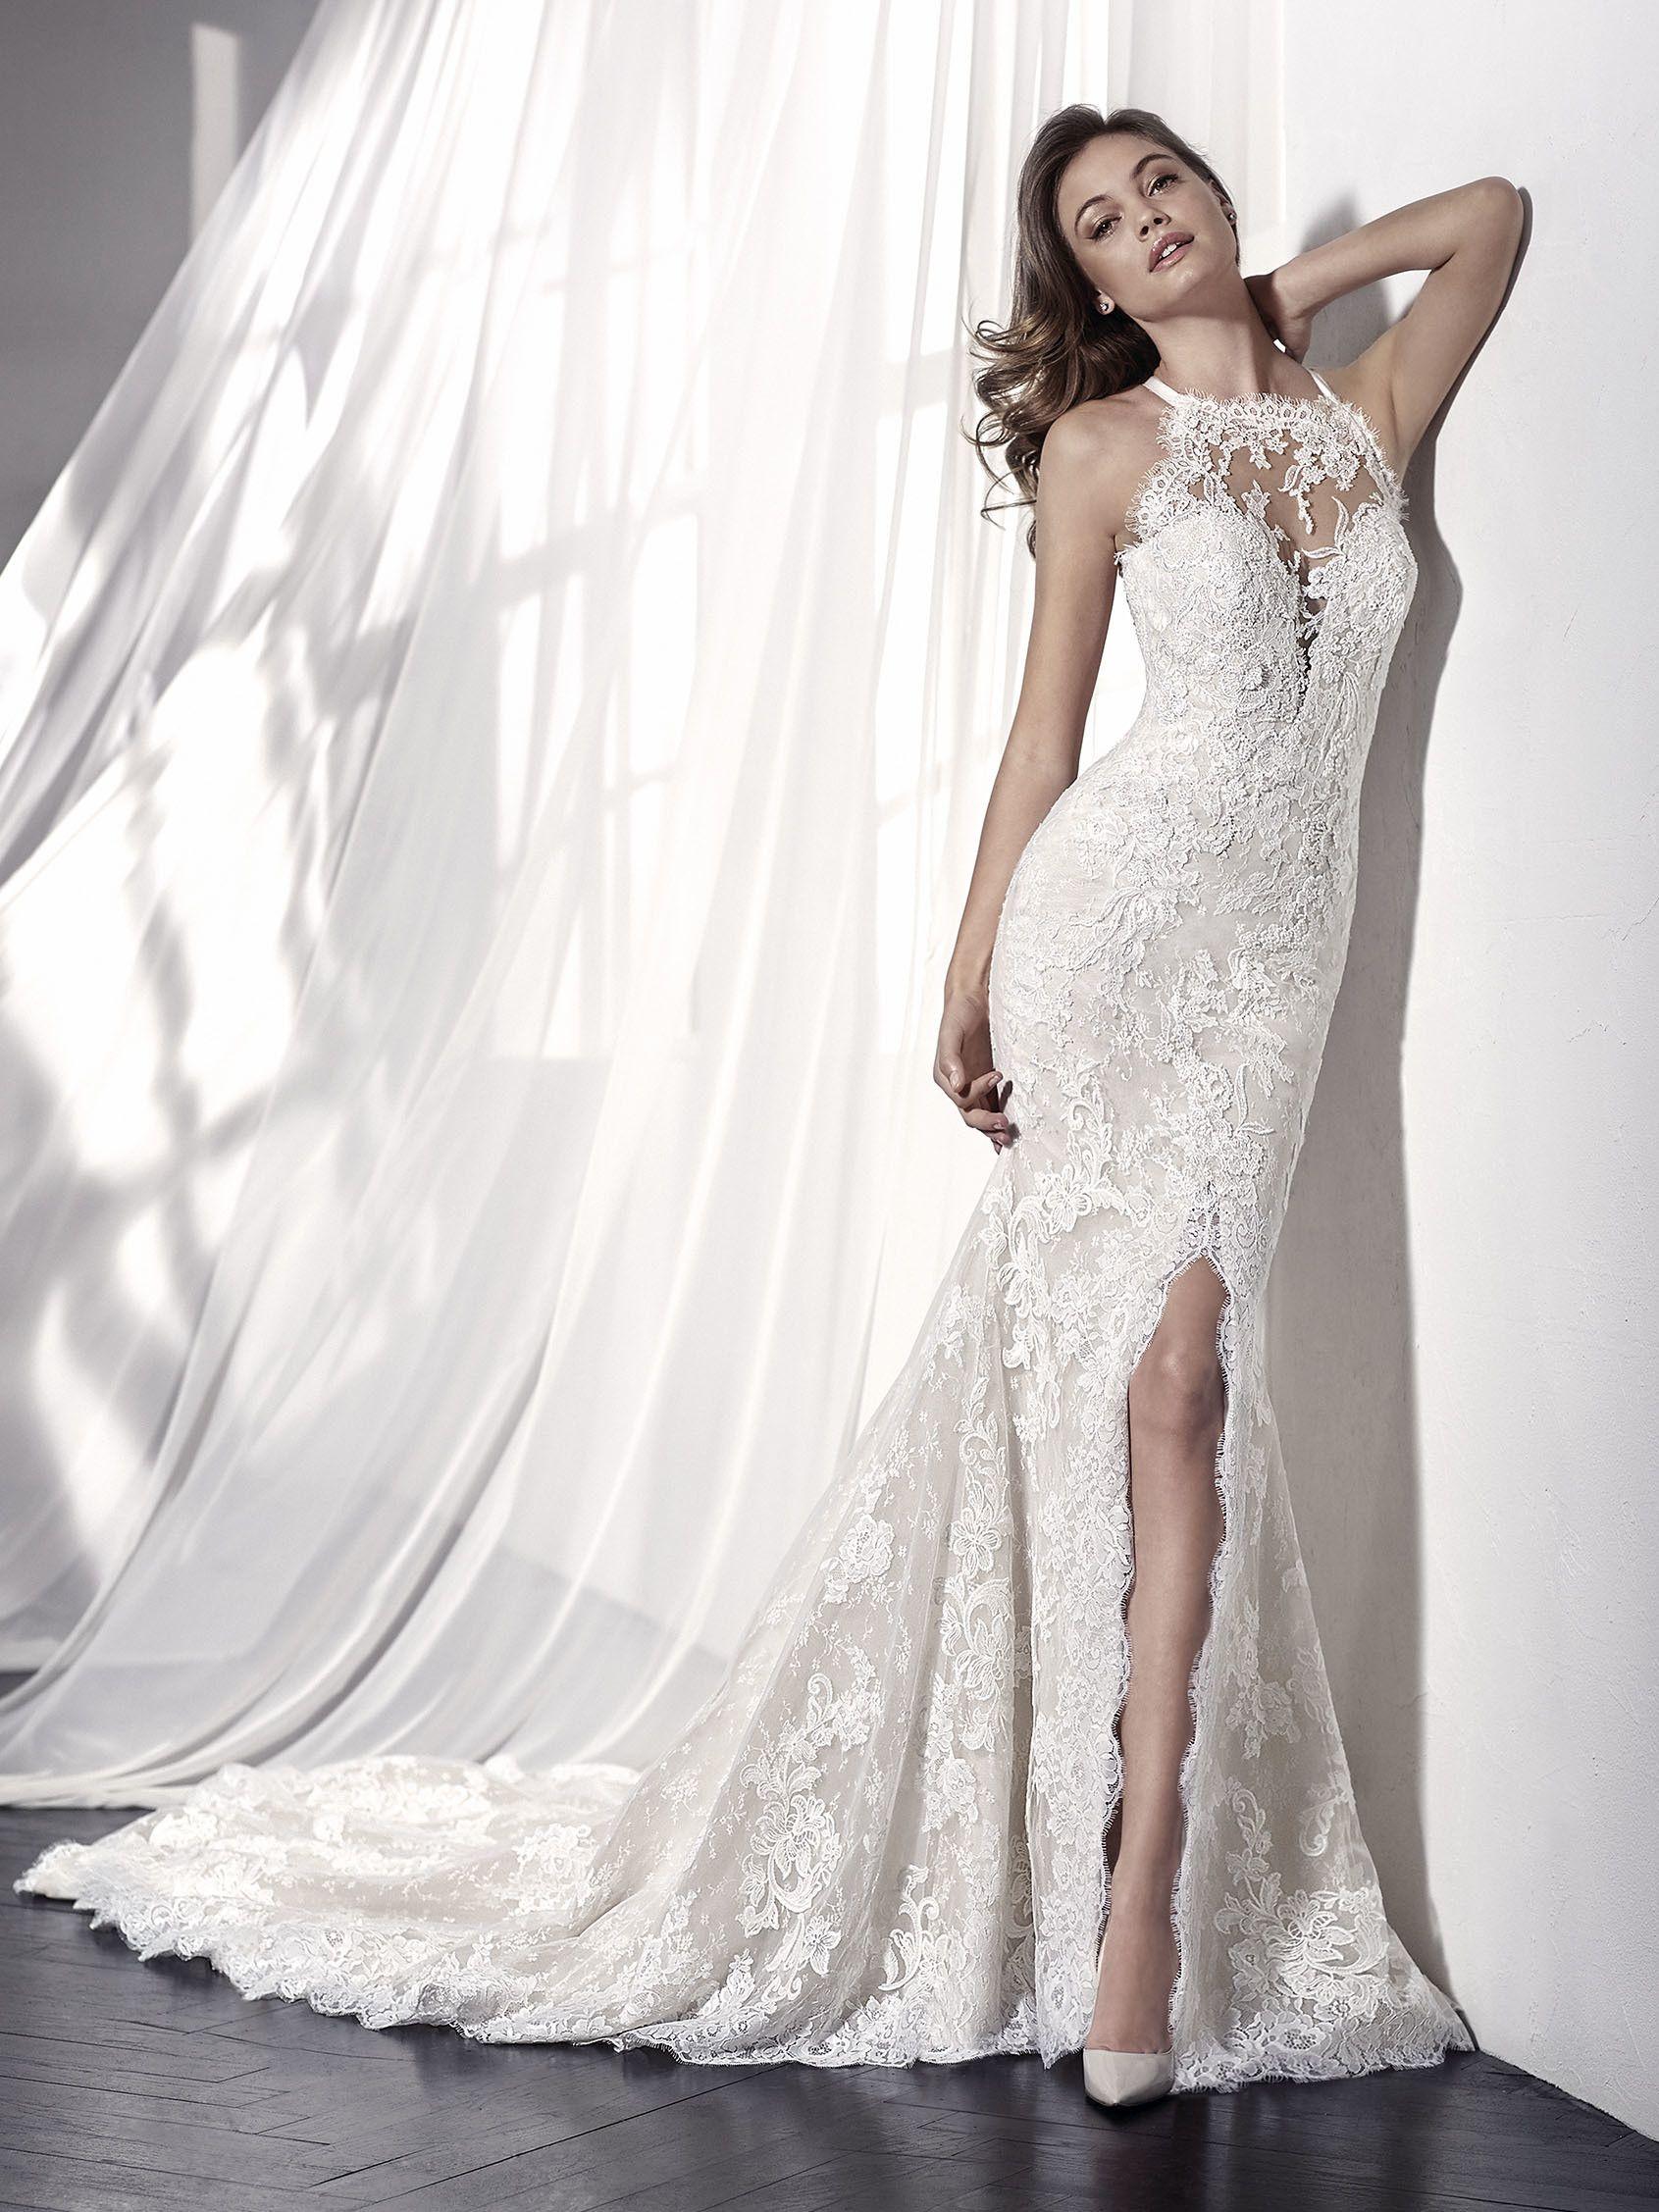 LEONILA vestido de novia escote halter | Vestidos de novia ...